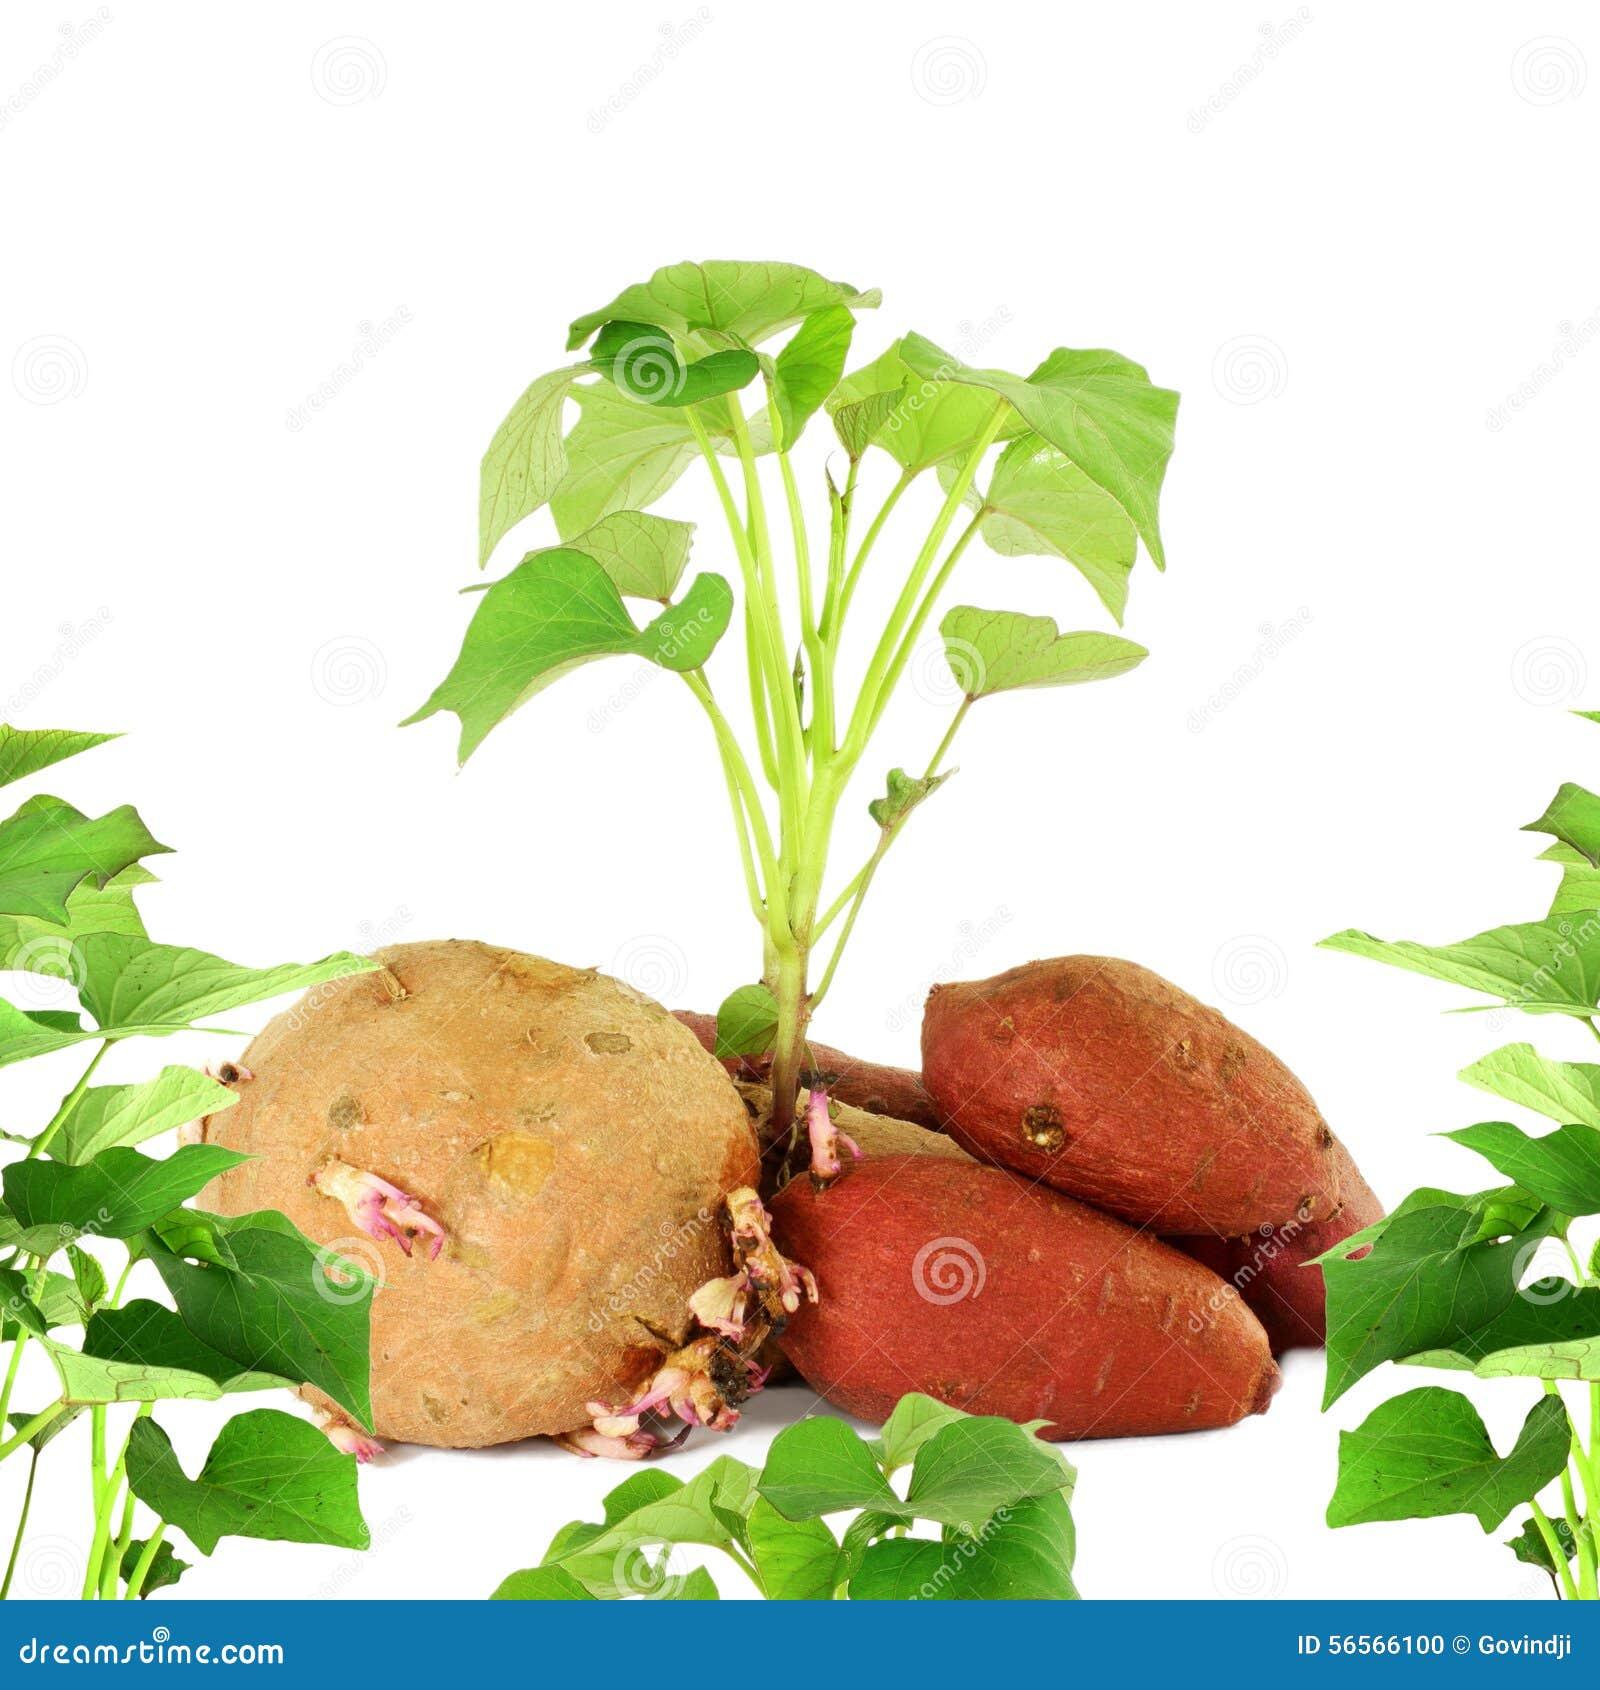 Download ανάπτυξη της γλυκιάς πατάτας με τους βλαστούς στο άσπρο υπόβαθρο Στοκ Εικόνες - εικόνα από κήπος, τρόφιμα: 56566100